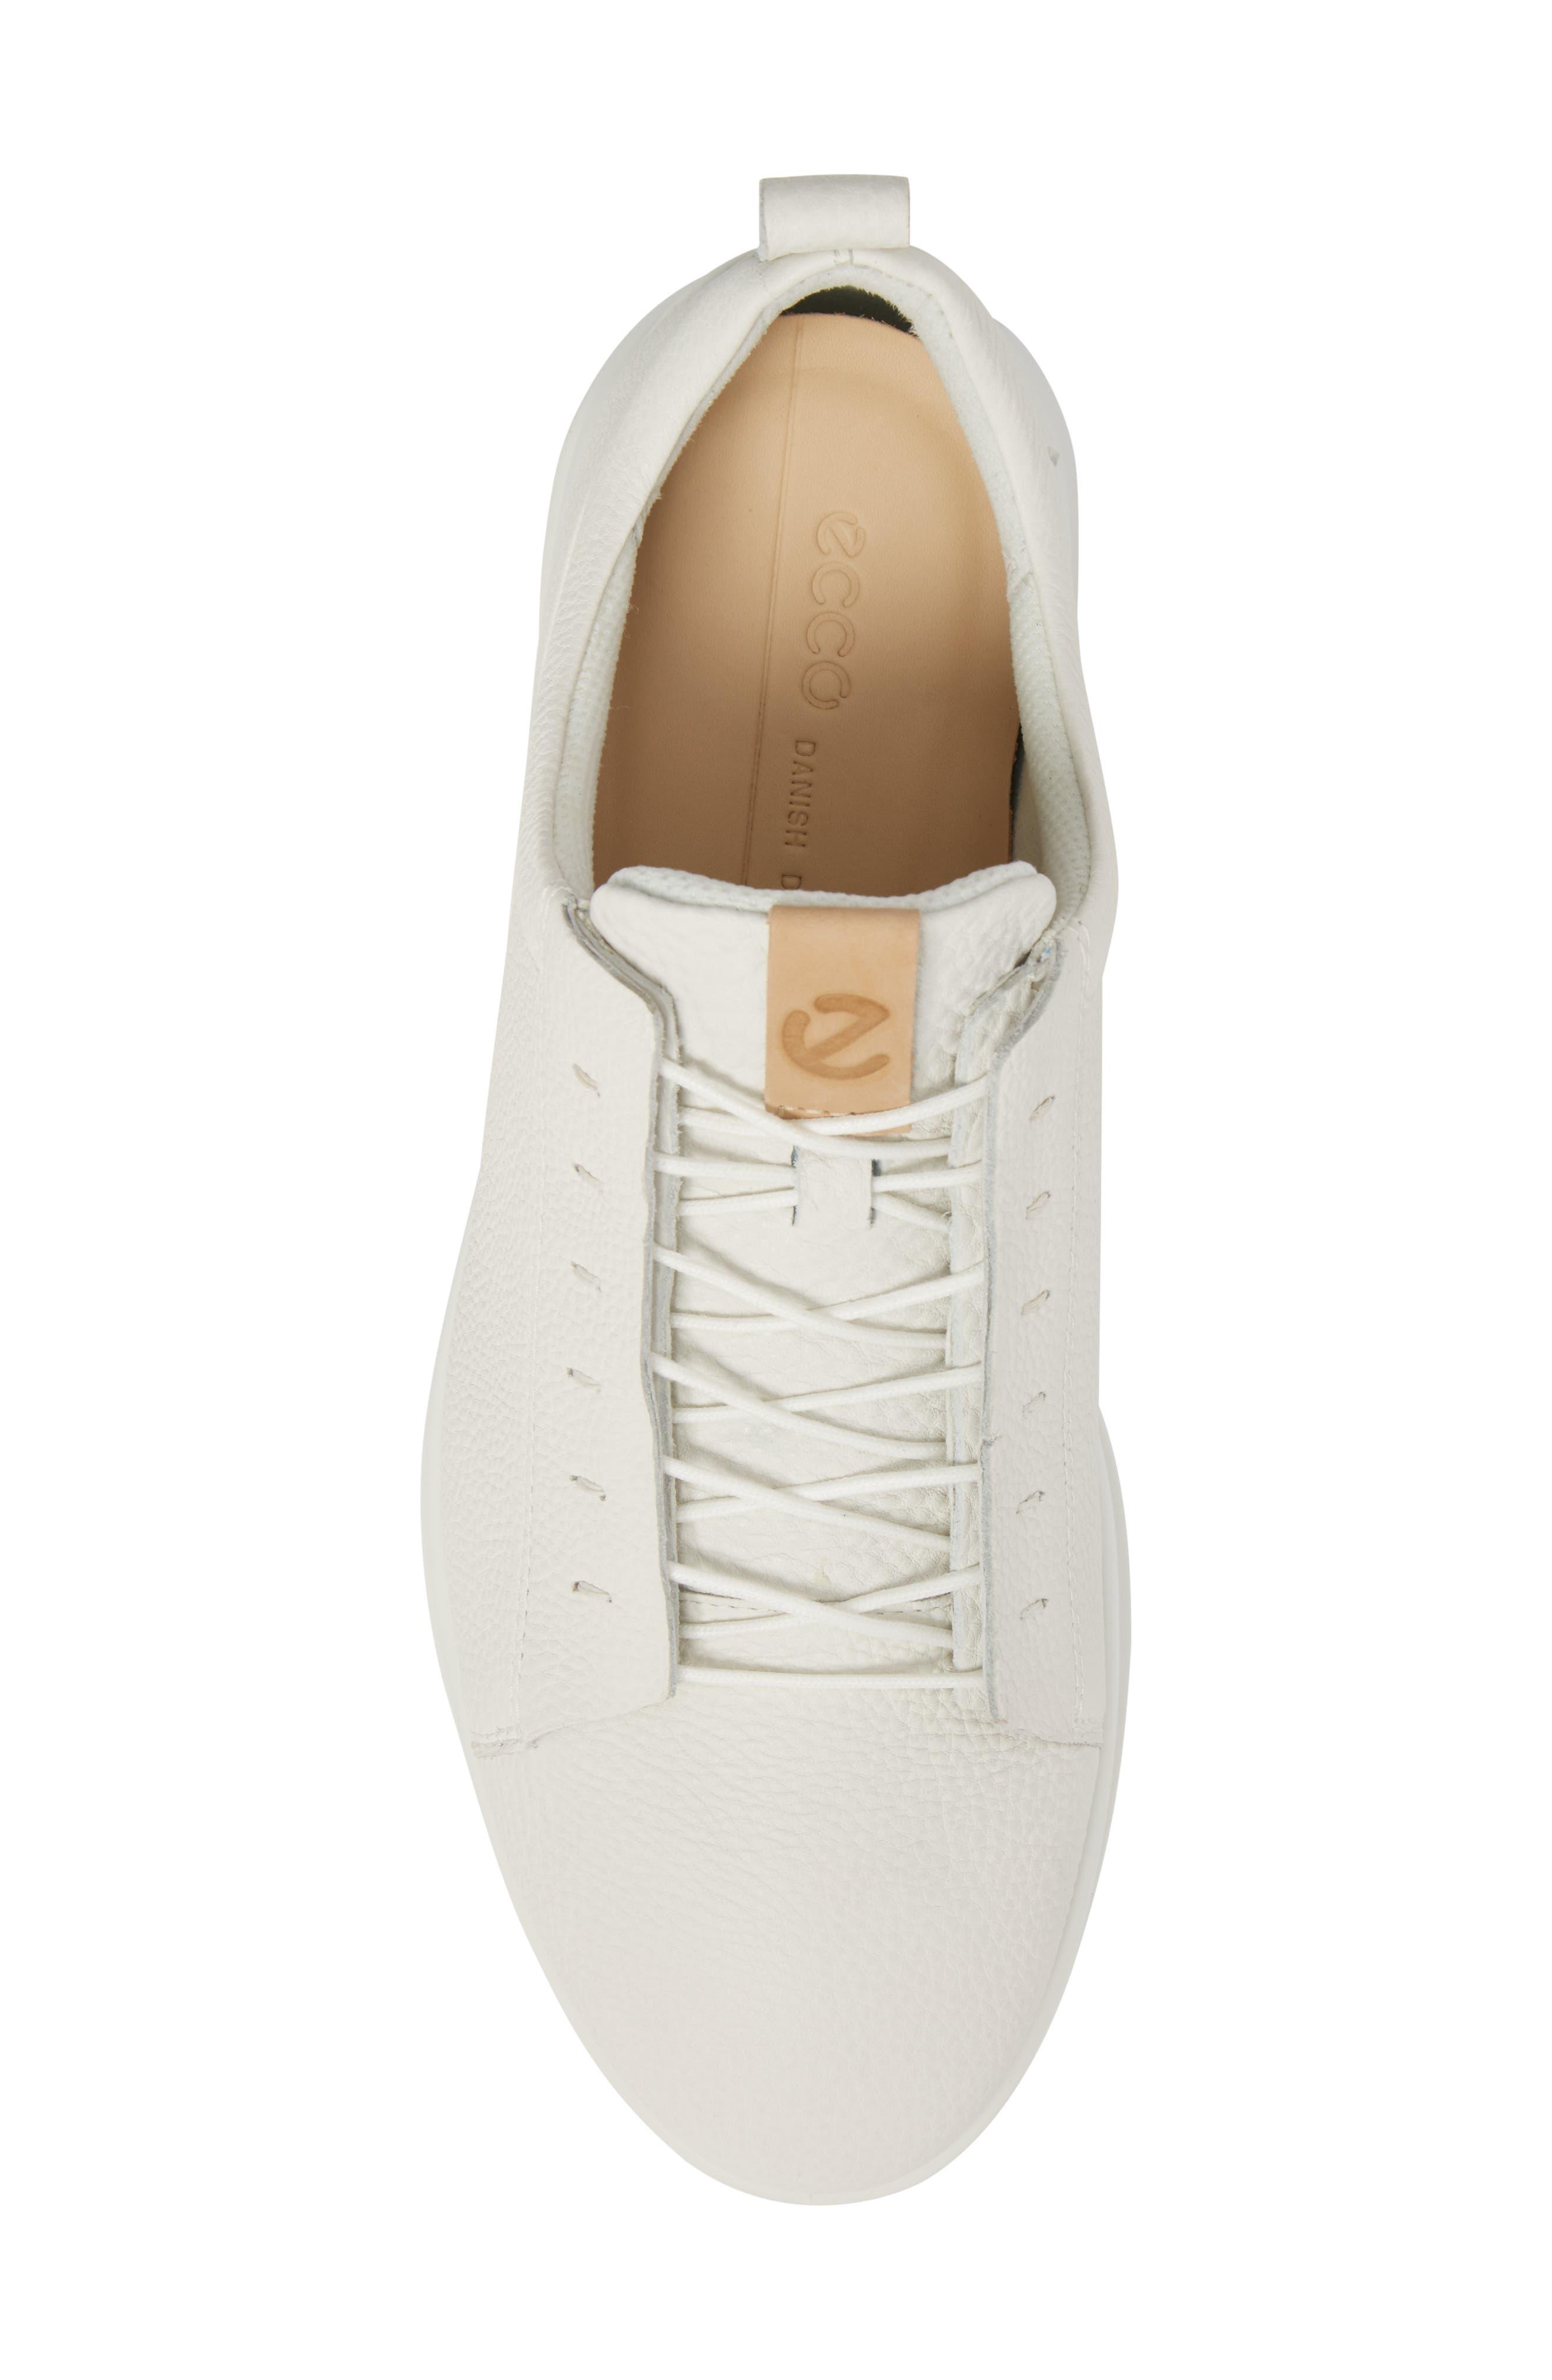 Aquet Low Top Sneaker,                             Alternate thumbnail 5, color,                             White Leather